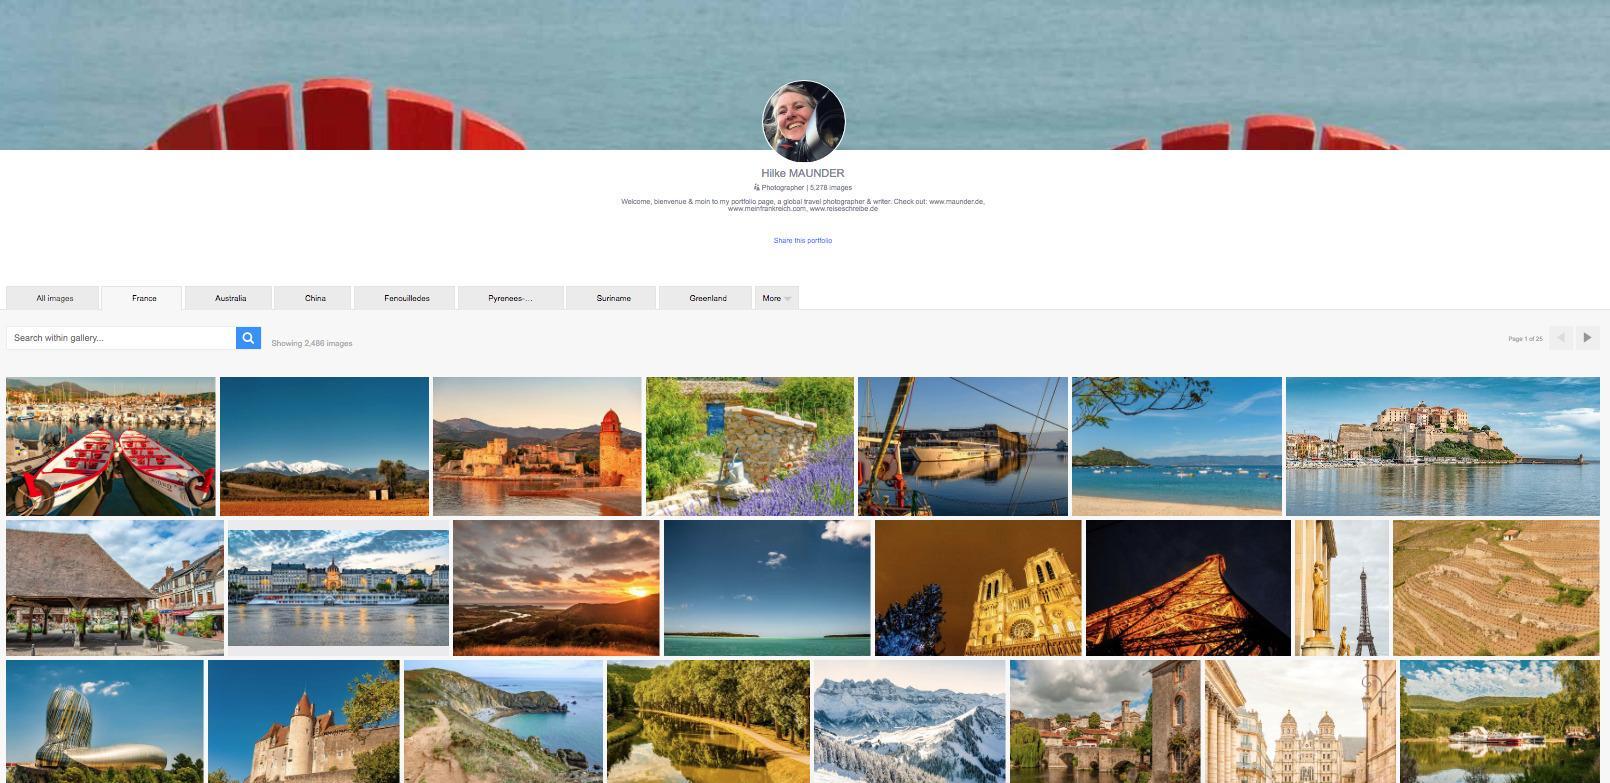 Hilke Maunder: Frankreich bei Alamy